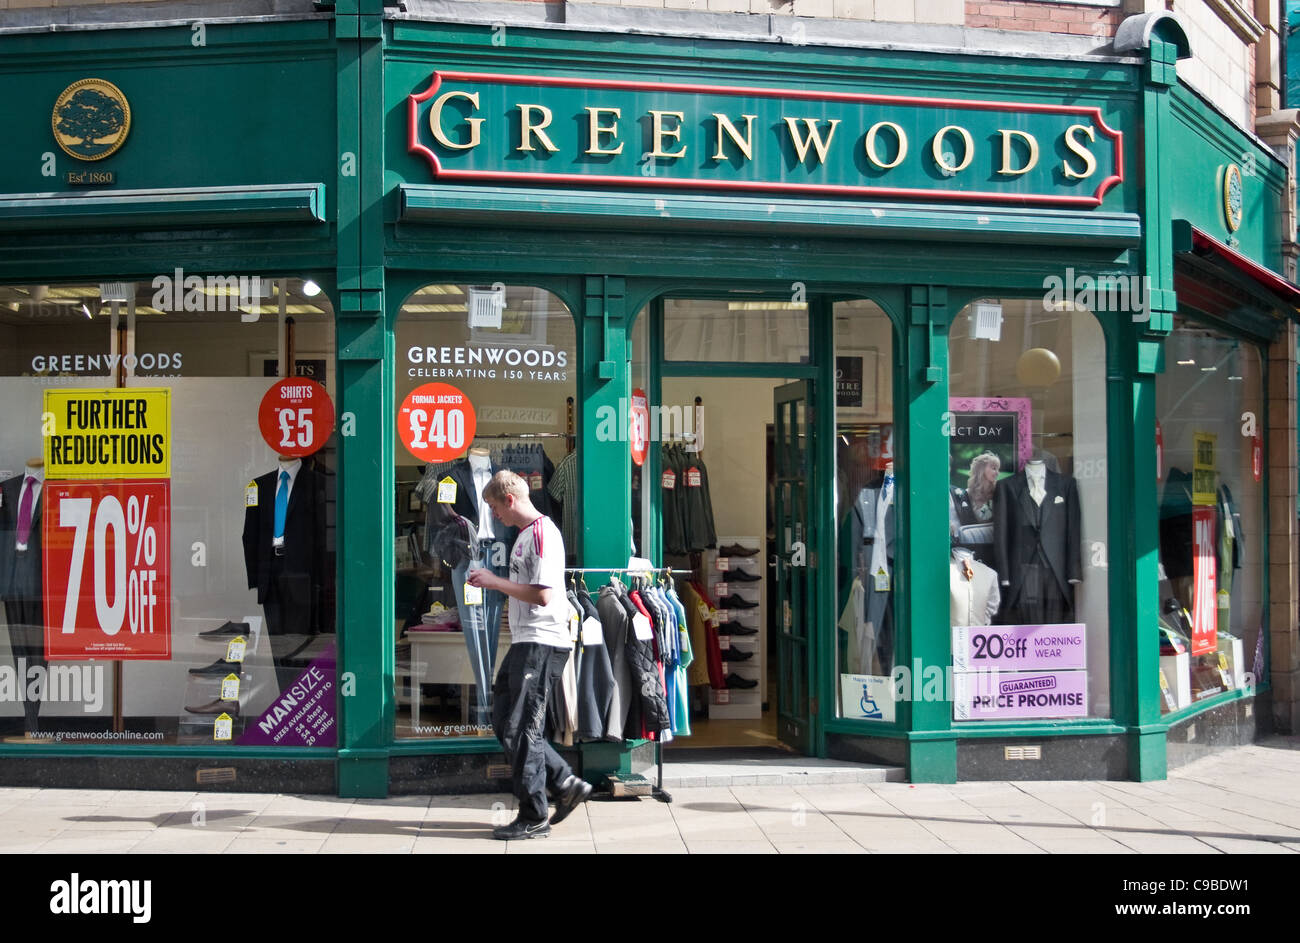 Greenwoods menswear shop, Coppergate, York, England, UK Stock Photo ...